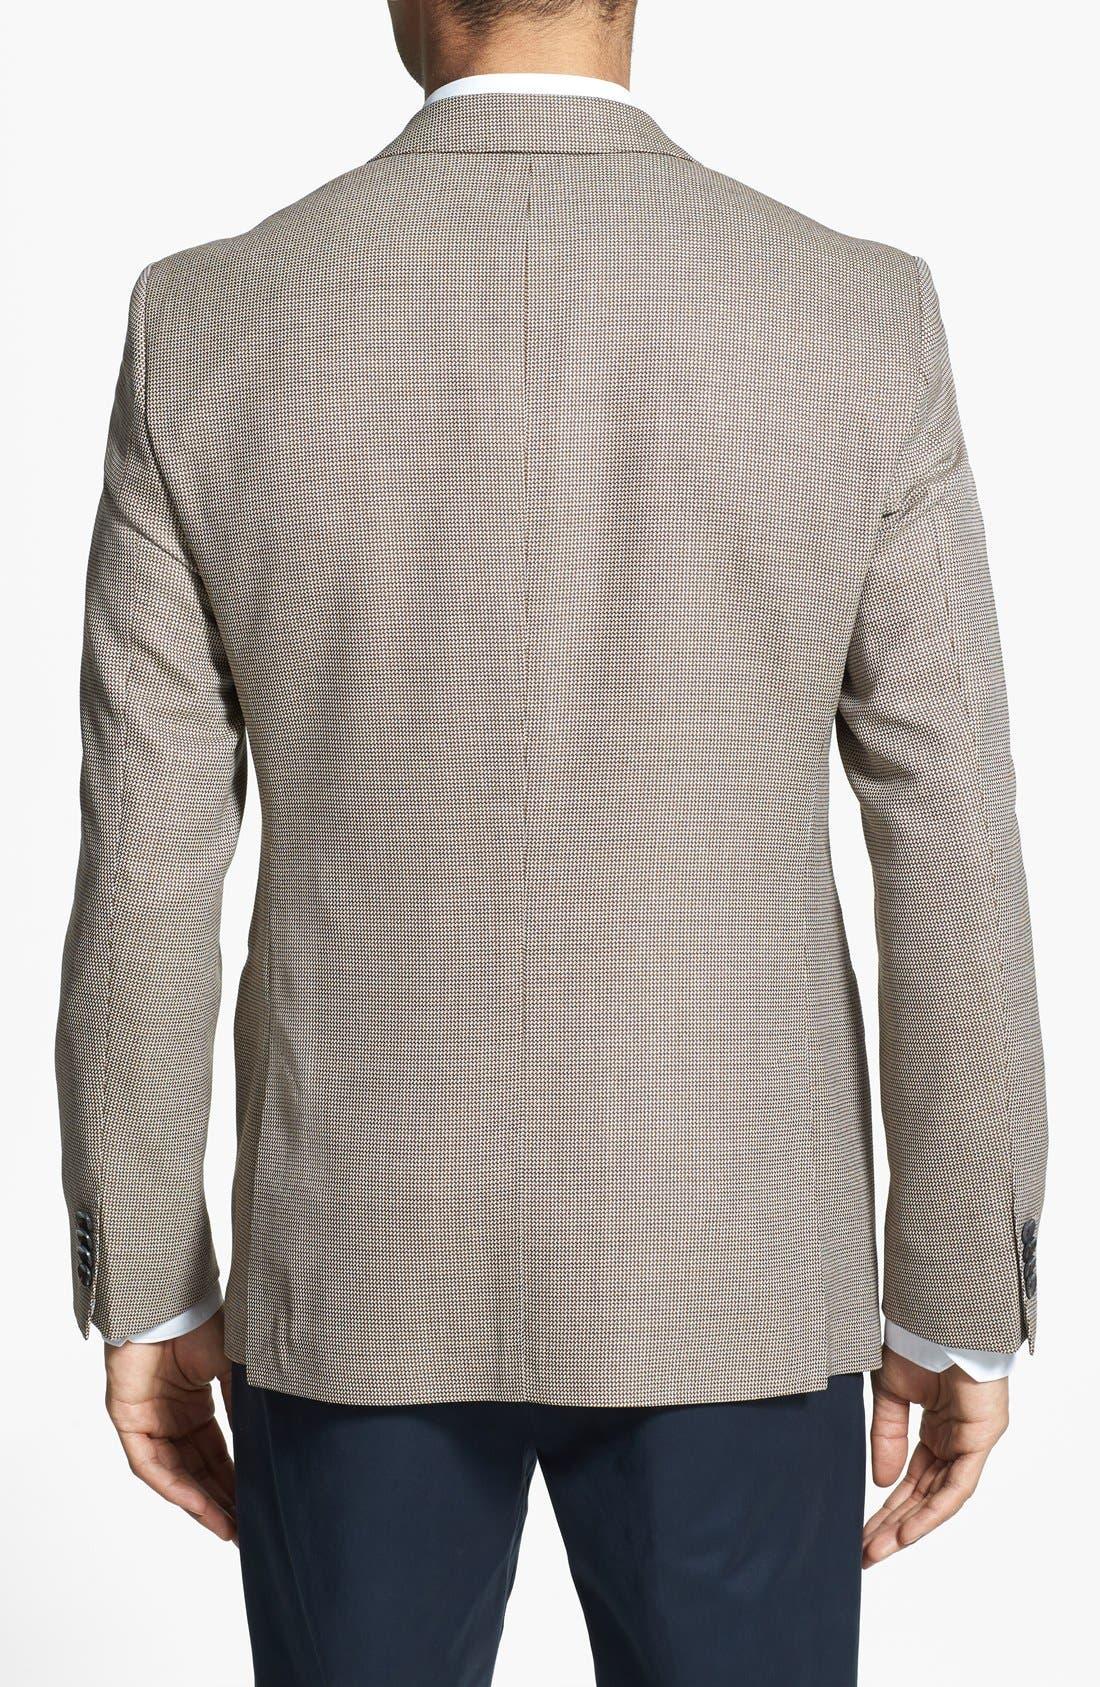 Alternate Image 2  - BOSS HUGO BOSS 'Jarrett' Trim Fit Wool Sportcoat